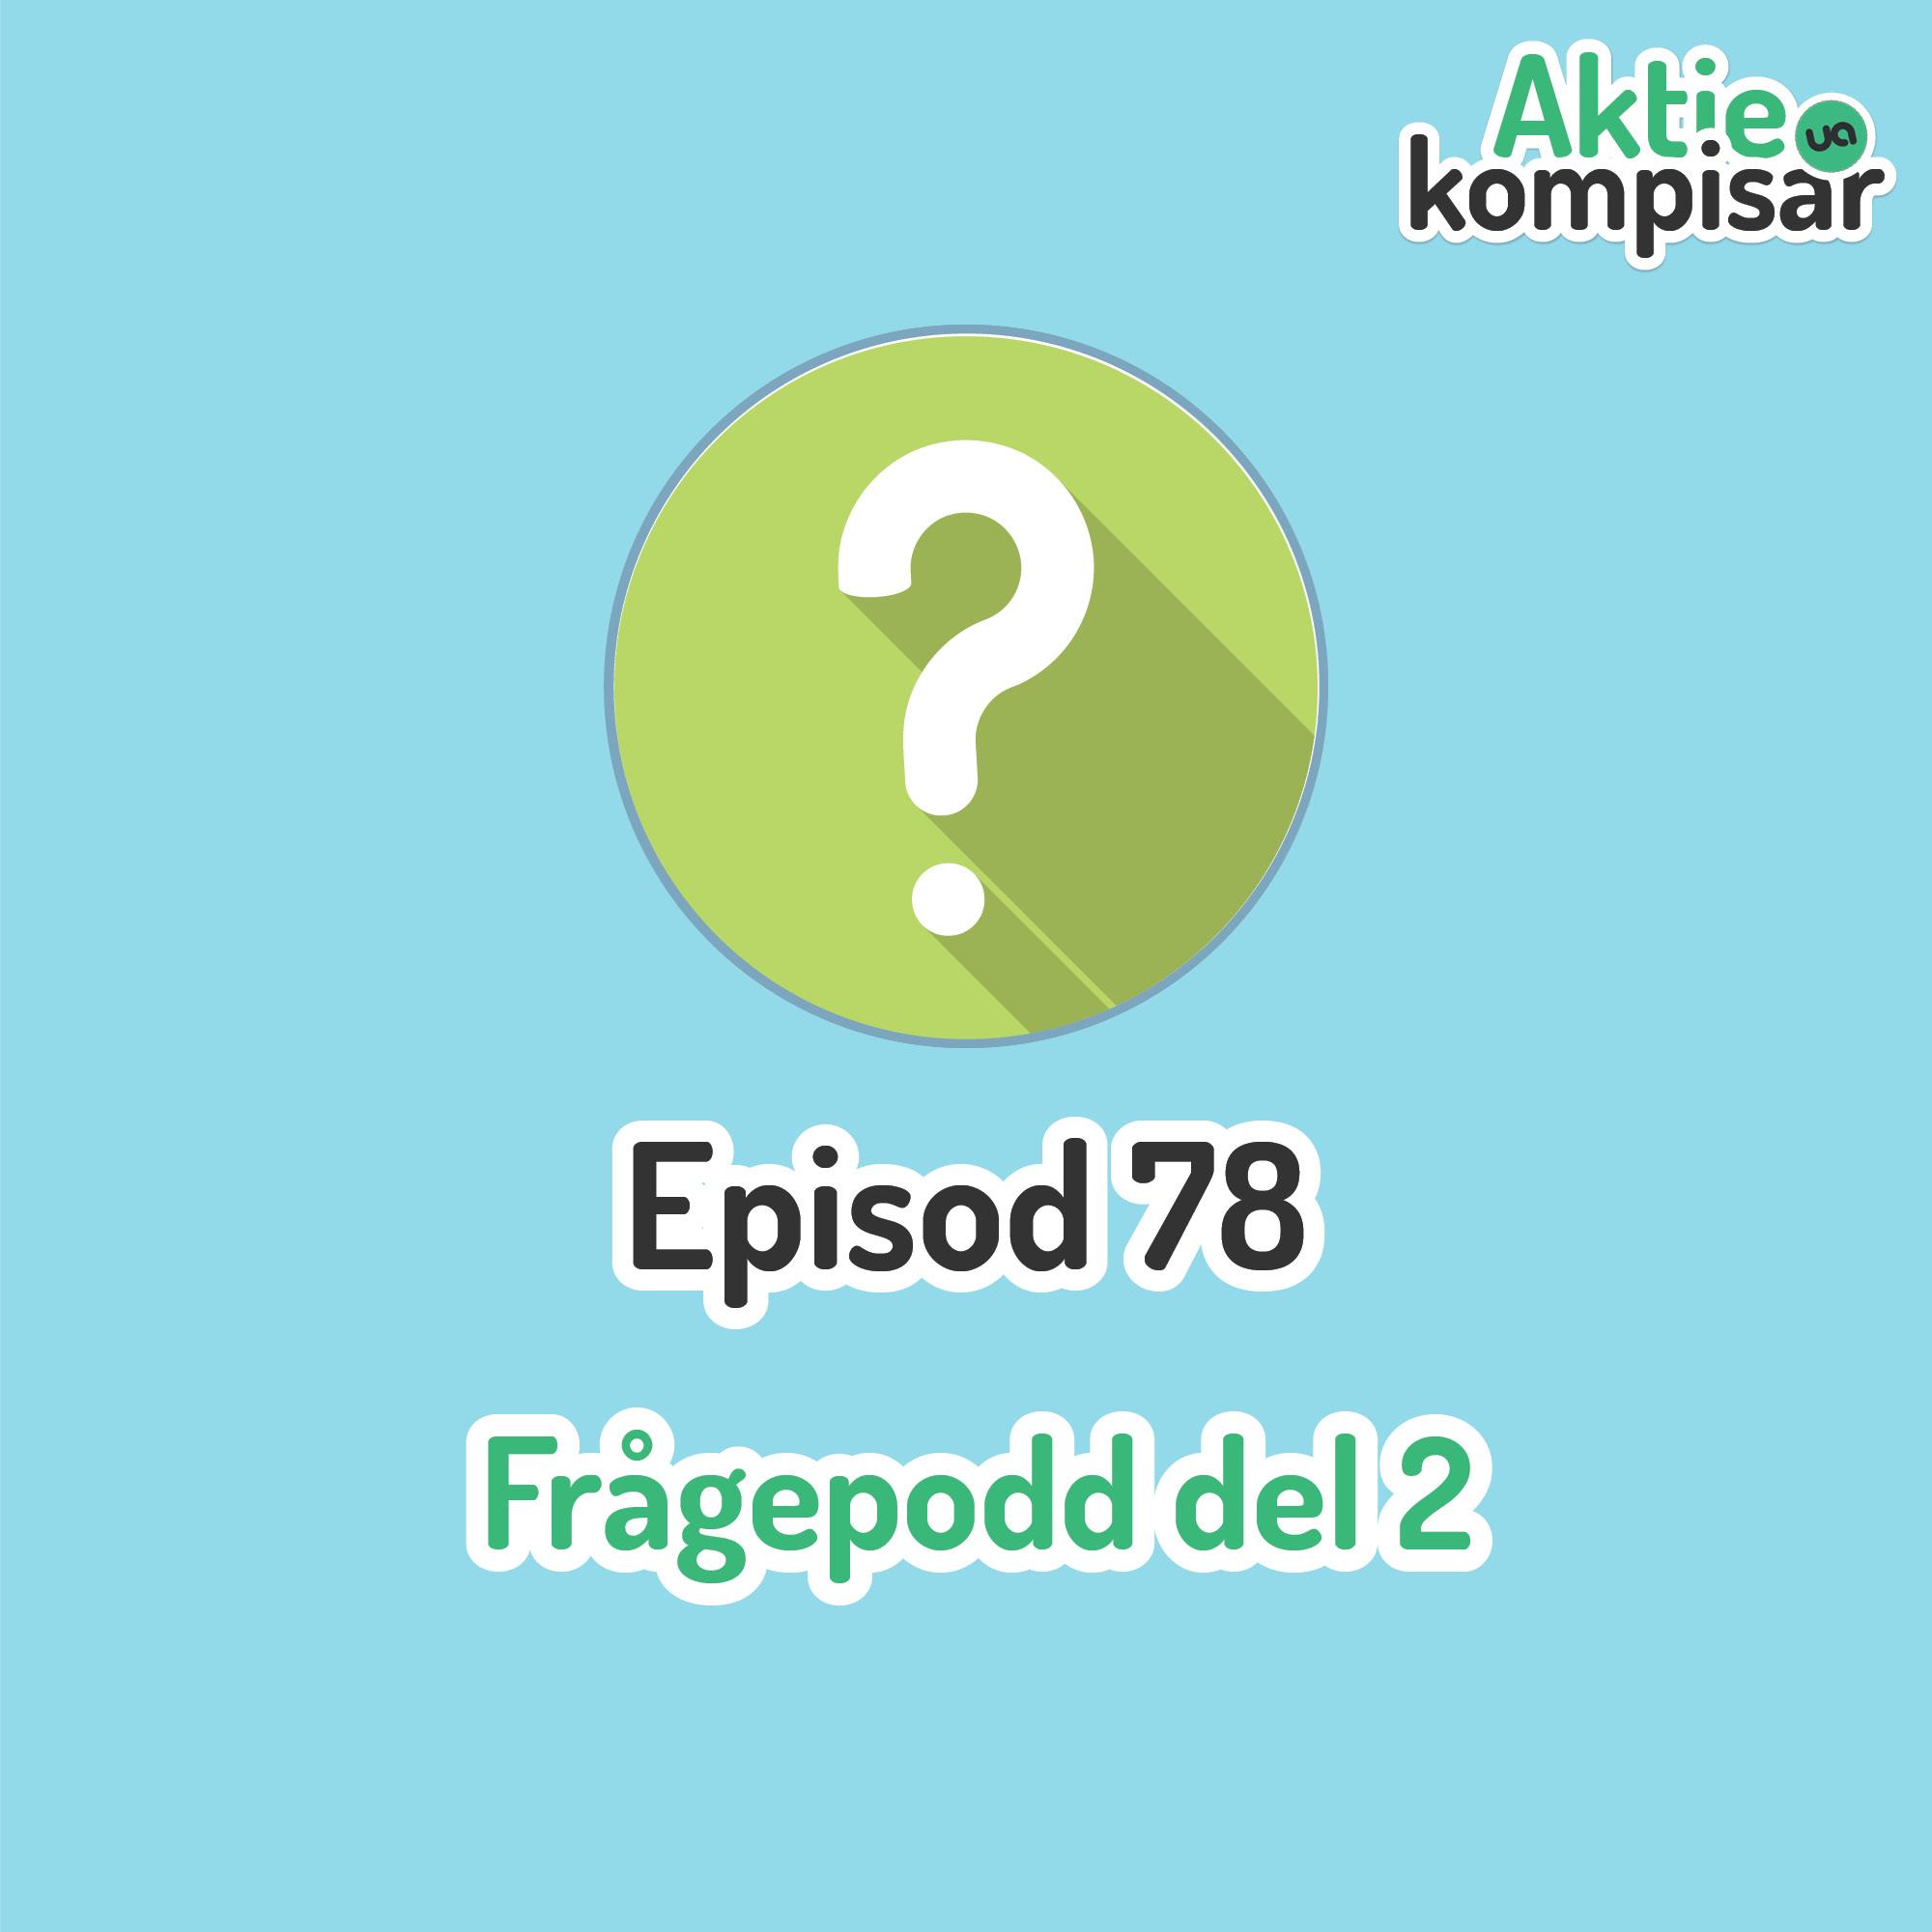 Podden episod 78 - Frågepodd del 2